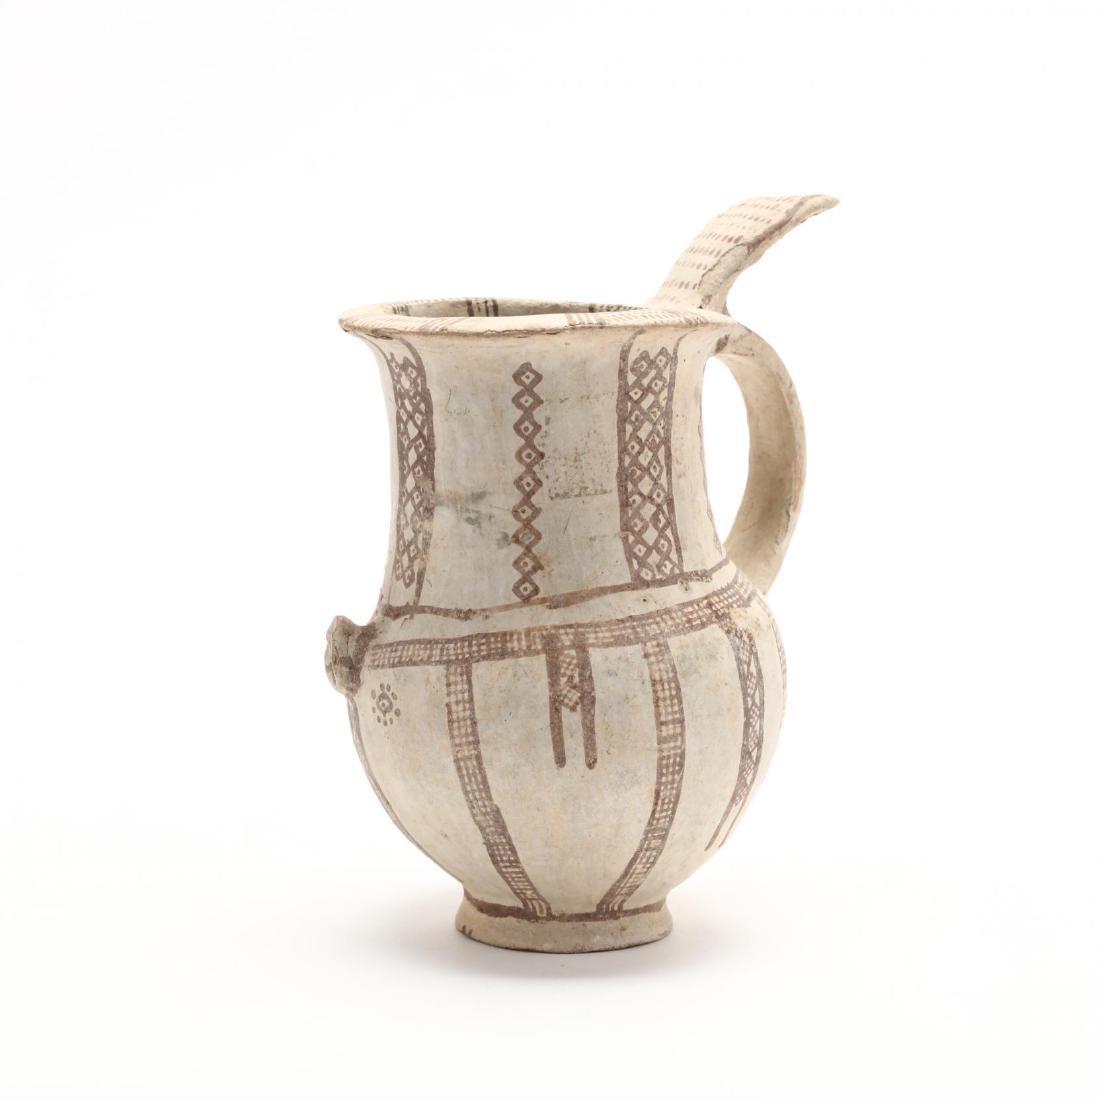 Cypriot Bronze Age Bichrome Jug - 3